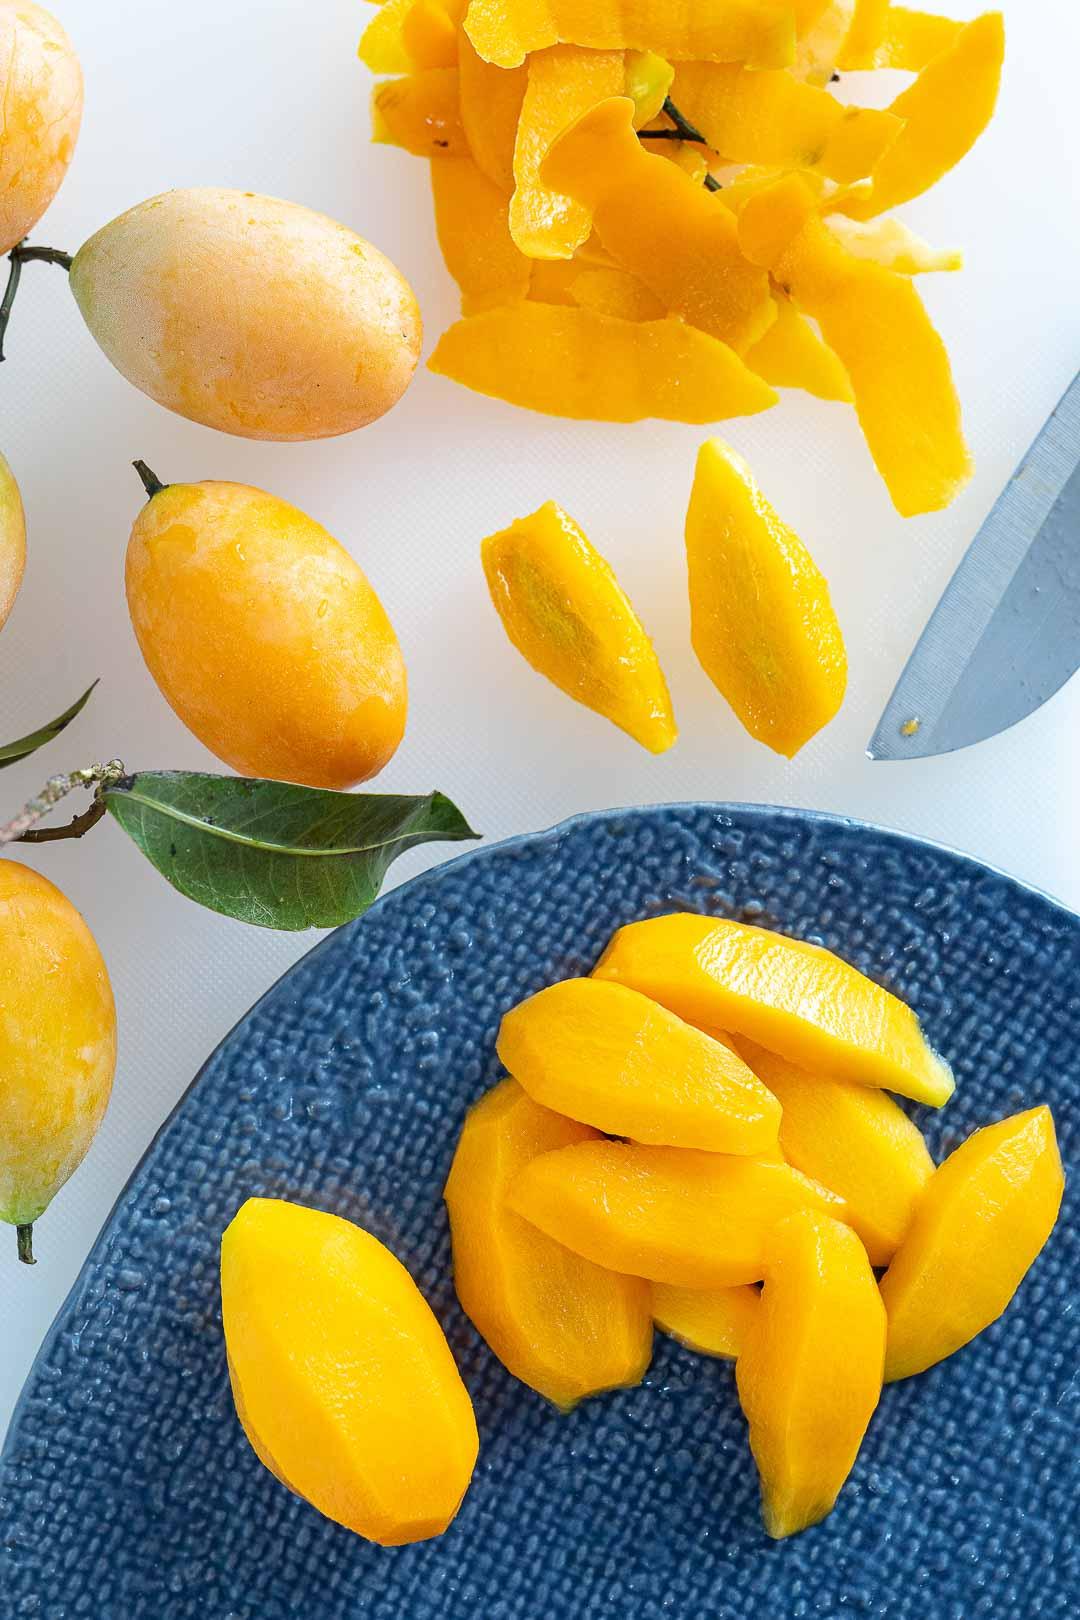 fresh plum mangos ready to eat - มะยงชิด